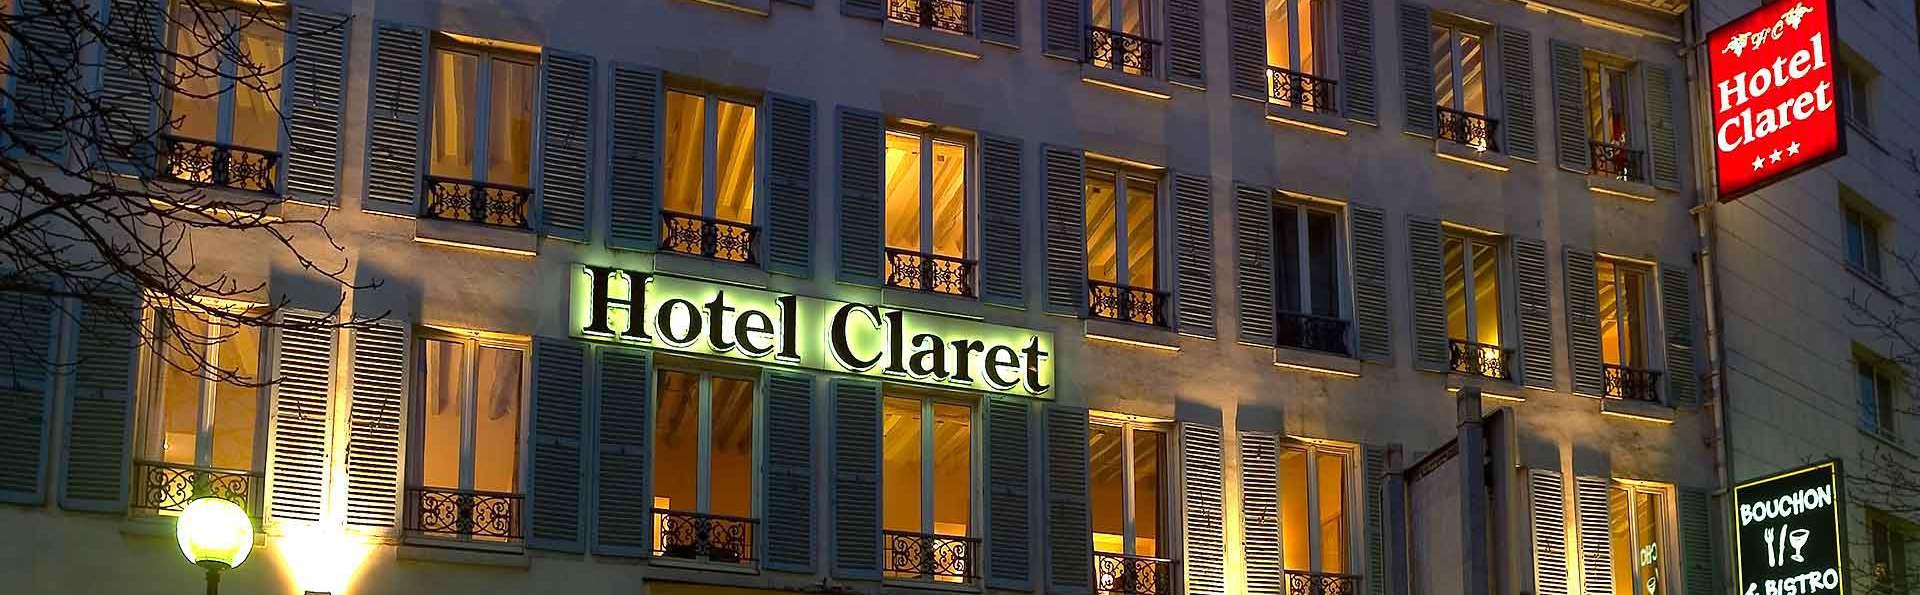 Hôtel Claret Bercy - Edit_Front.jpg